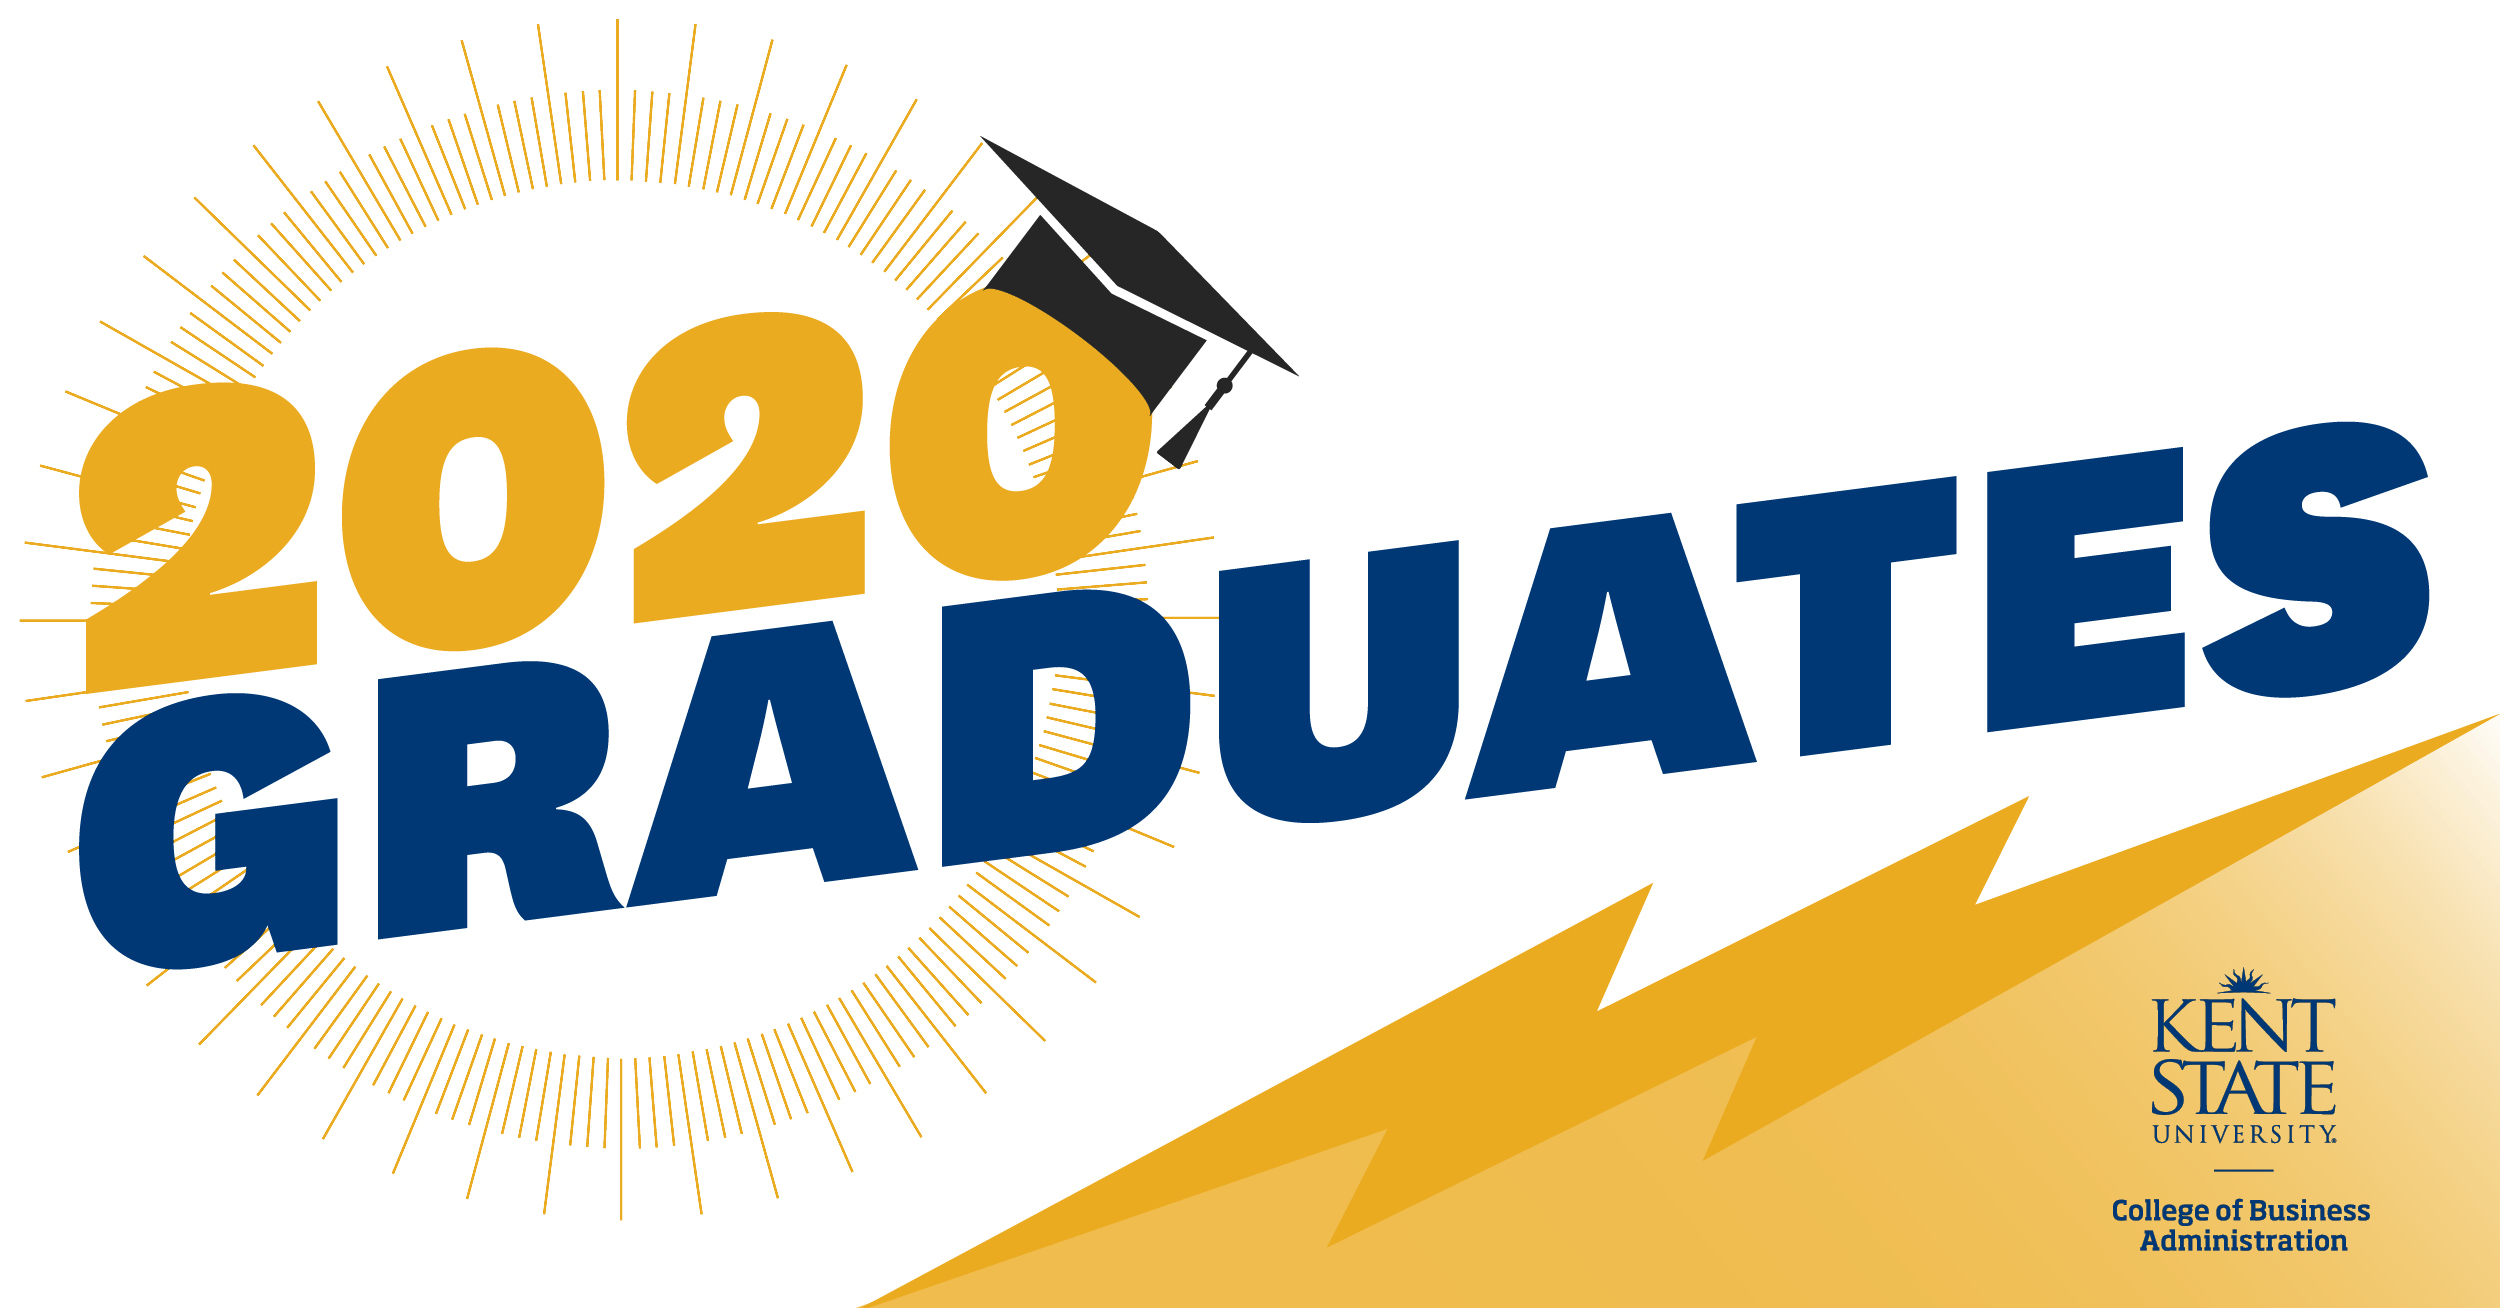 2020 banner